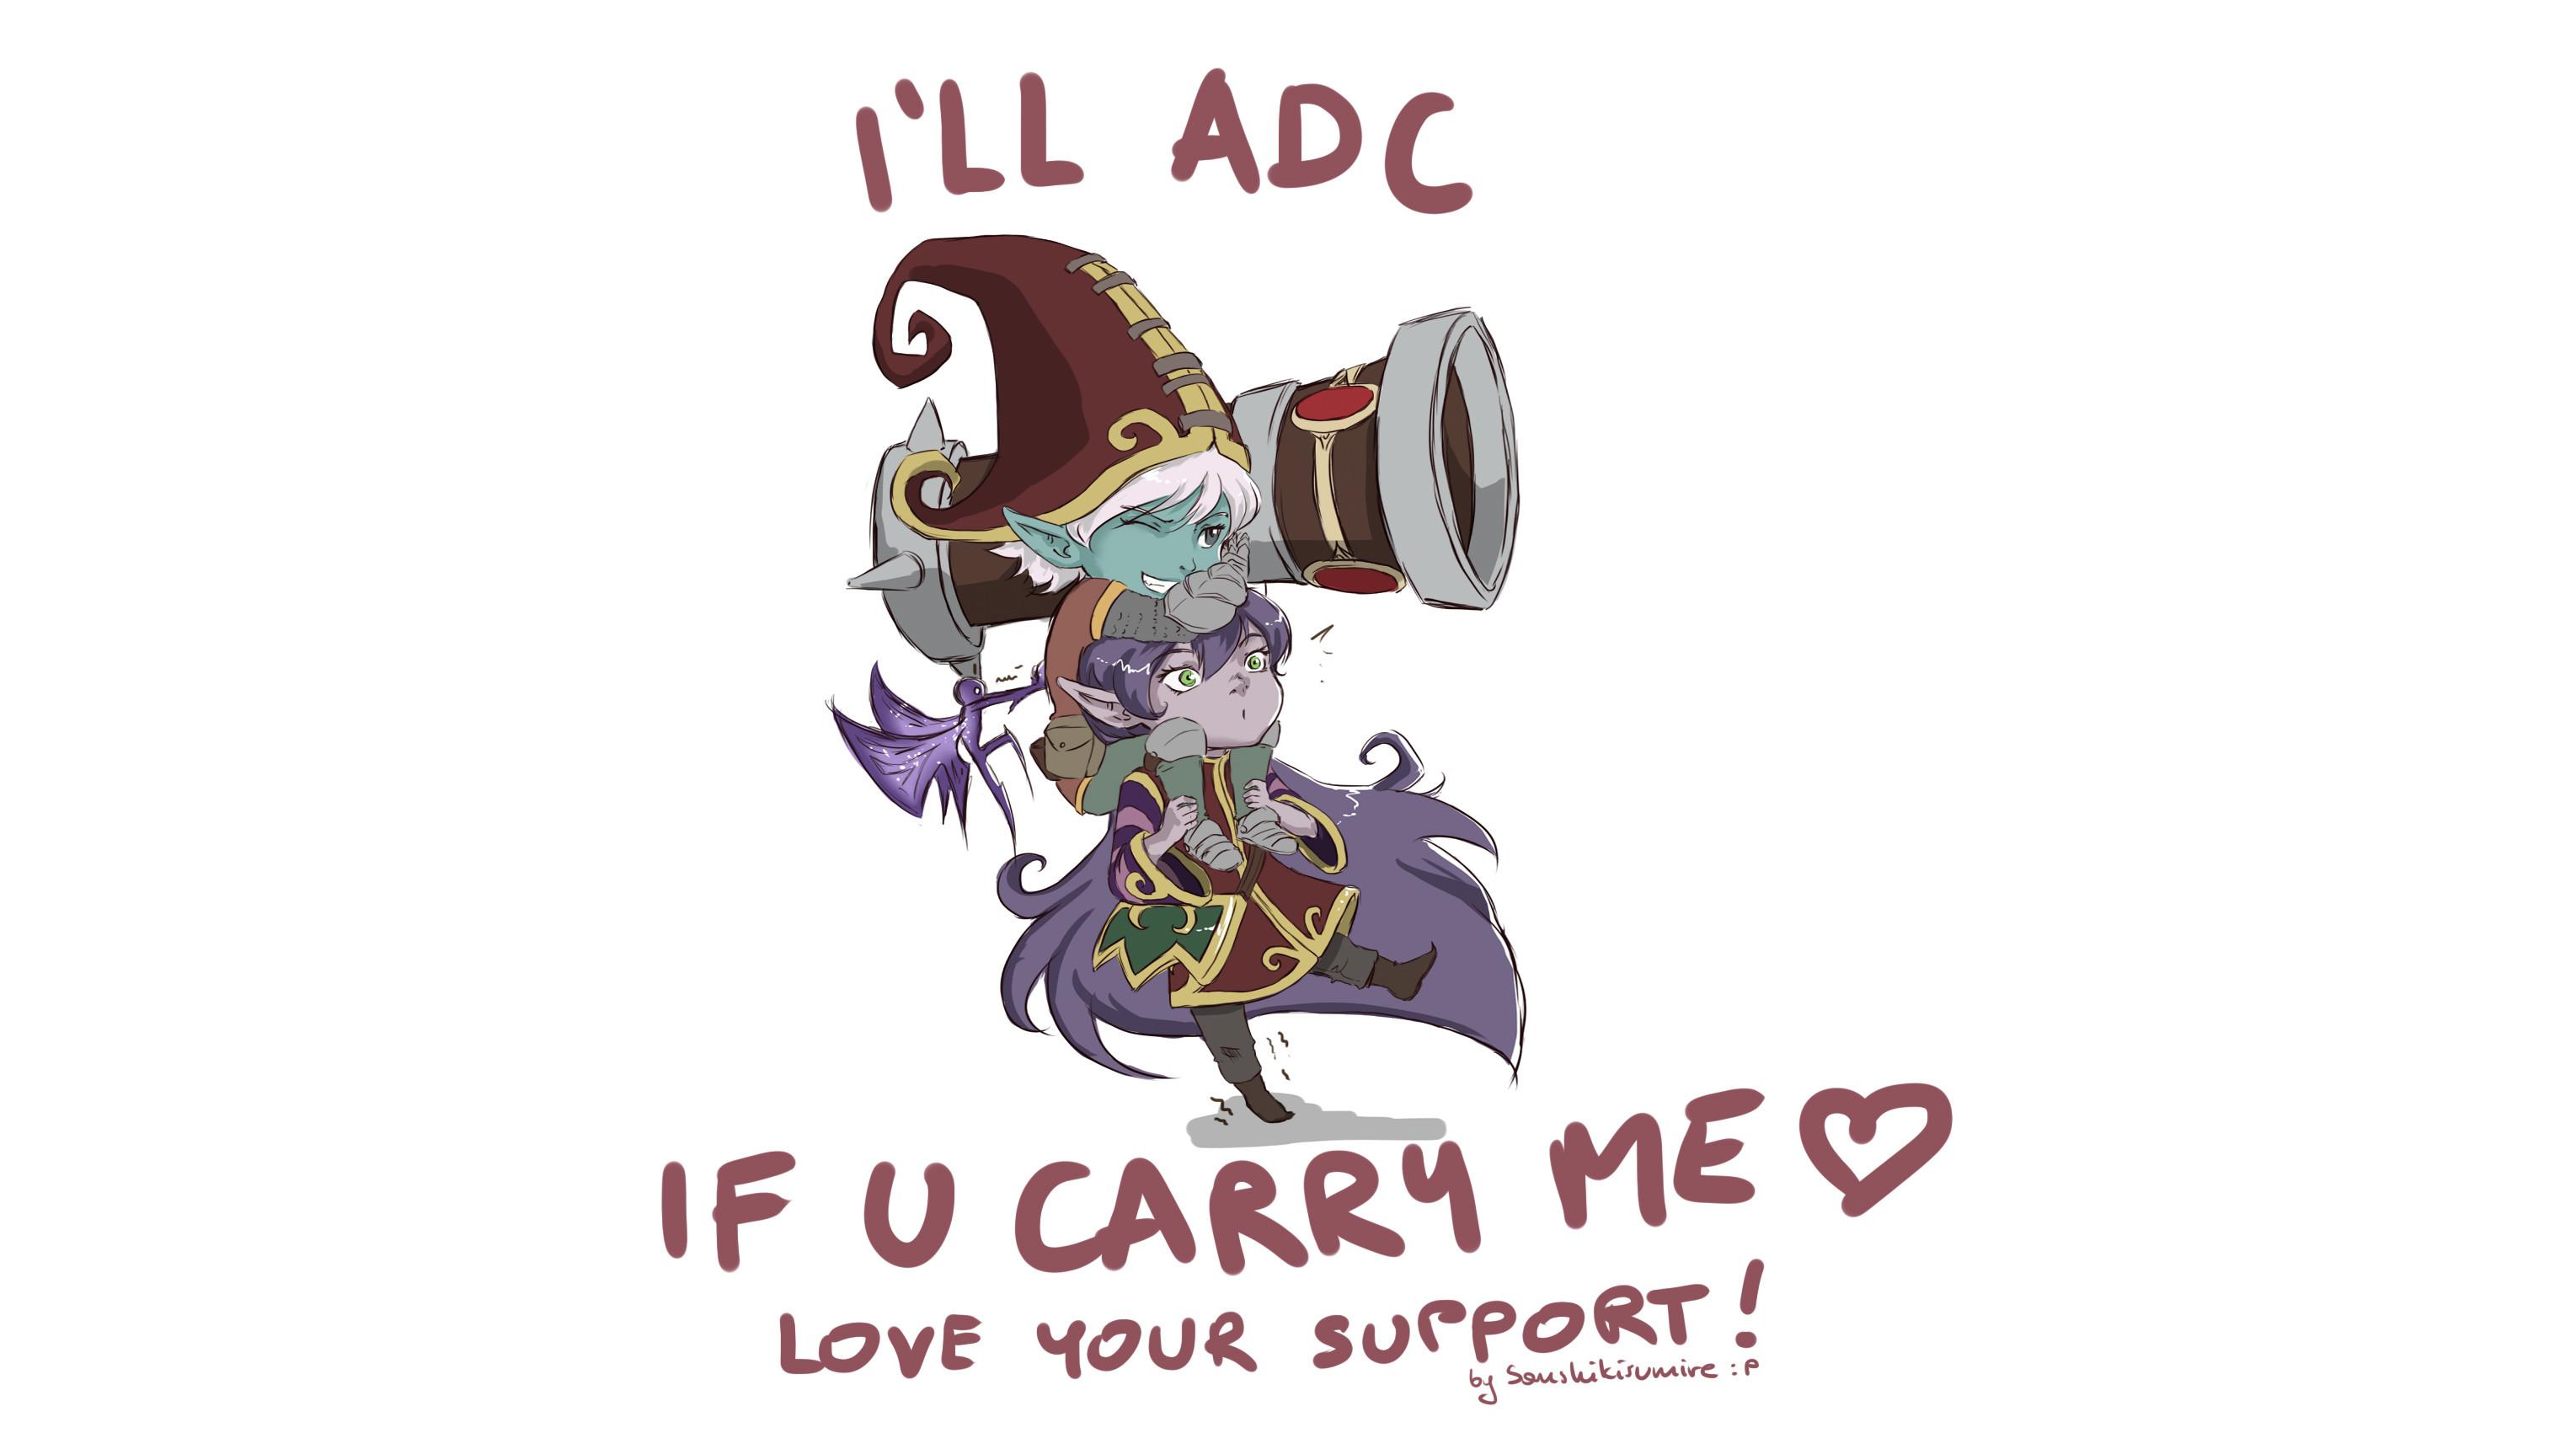 Tristana & Lulu (ADC & Support) by Sanshikisumire HD Wallpaper Fan Art  Artwork League